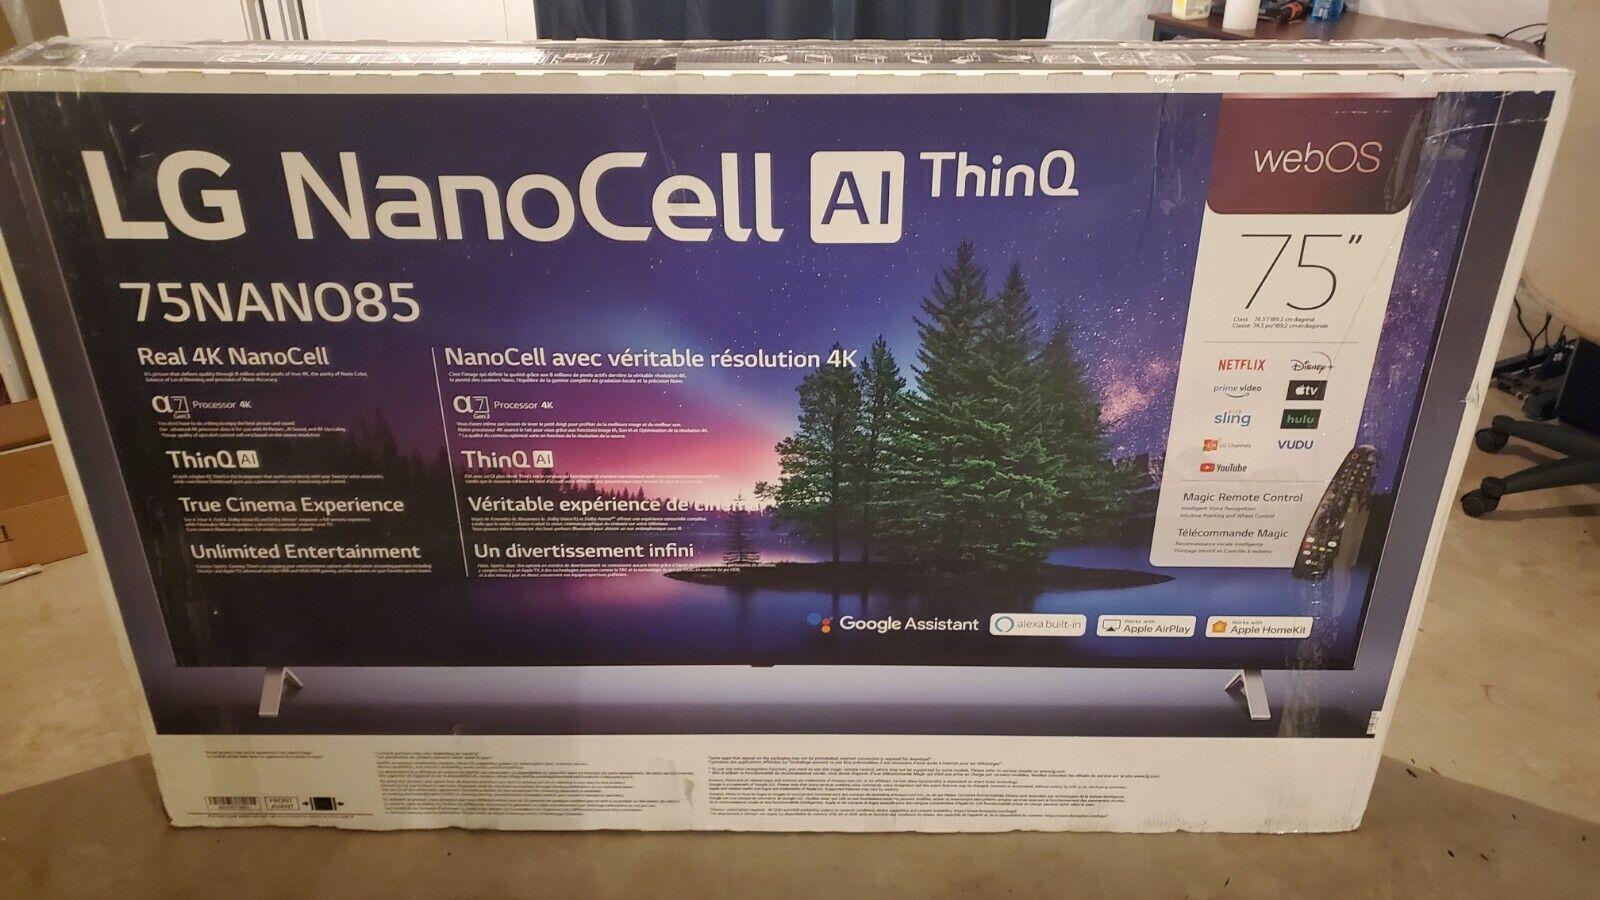 LG 75 NanoCell 85 Series 4K UHD HDR Smart TV - 2020 Model *75NANO85. Available Now for 1100.00